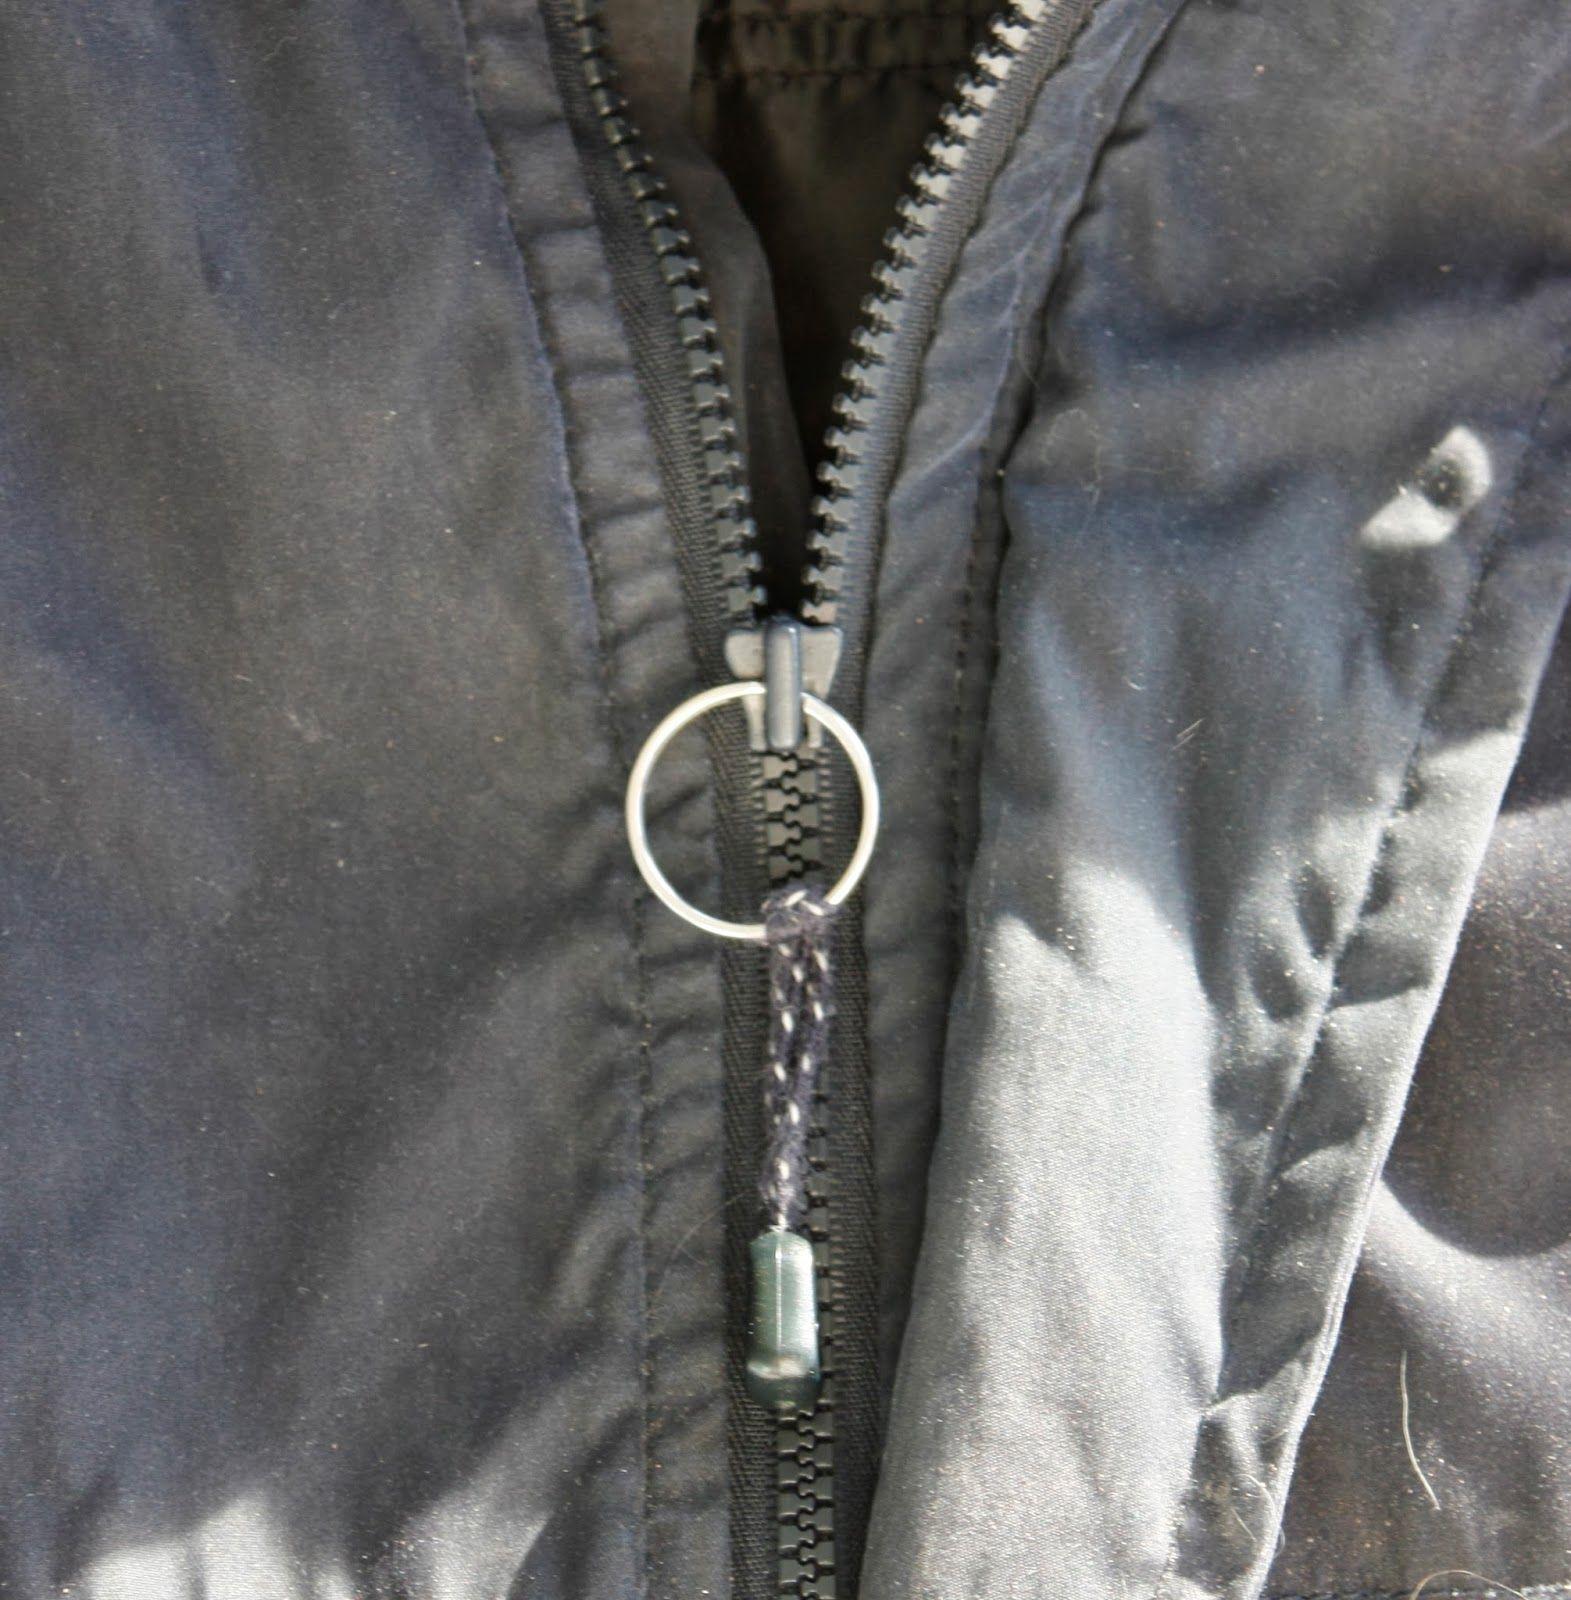 25 unique fix broken zipper ideas on pinterest zipper repair near me broken zipper and. Black Bedroom Furniture Sets. Home Design Ideas